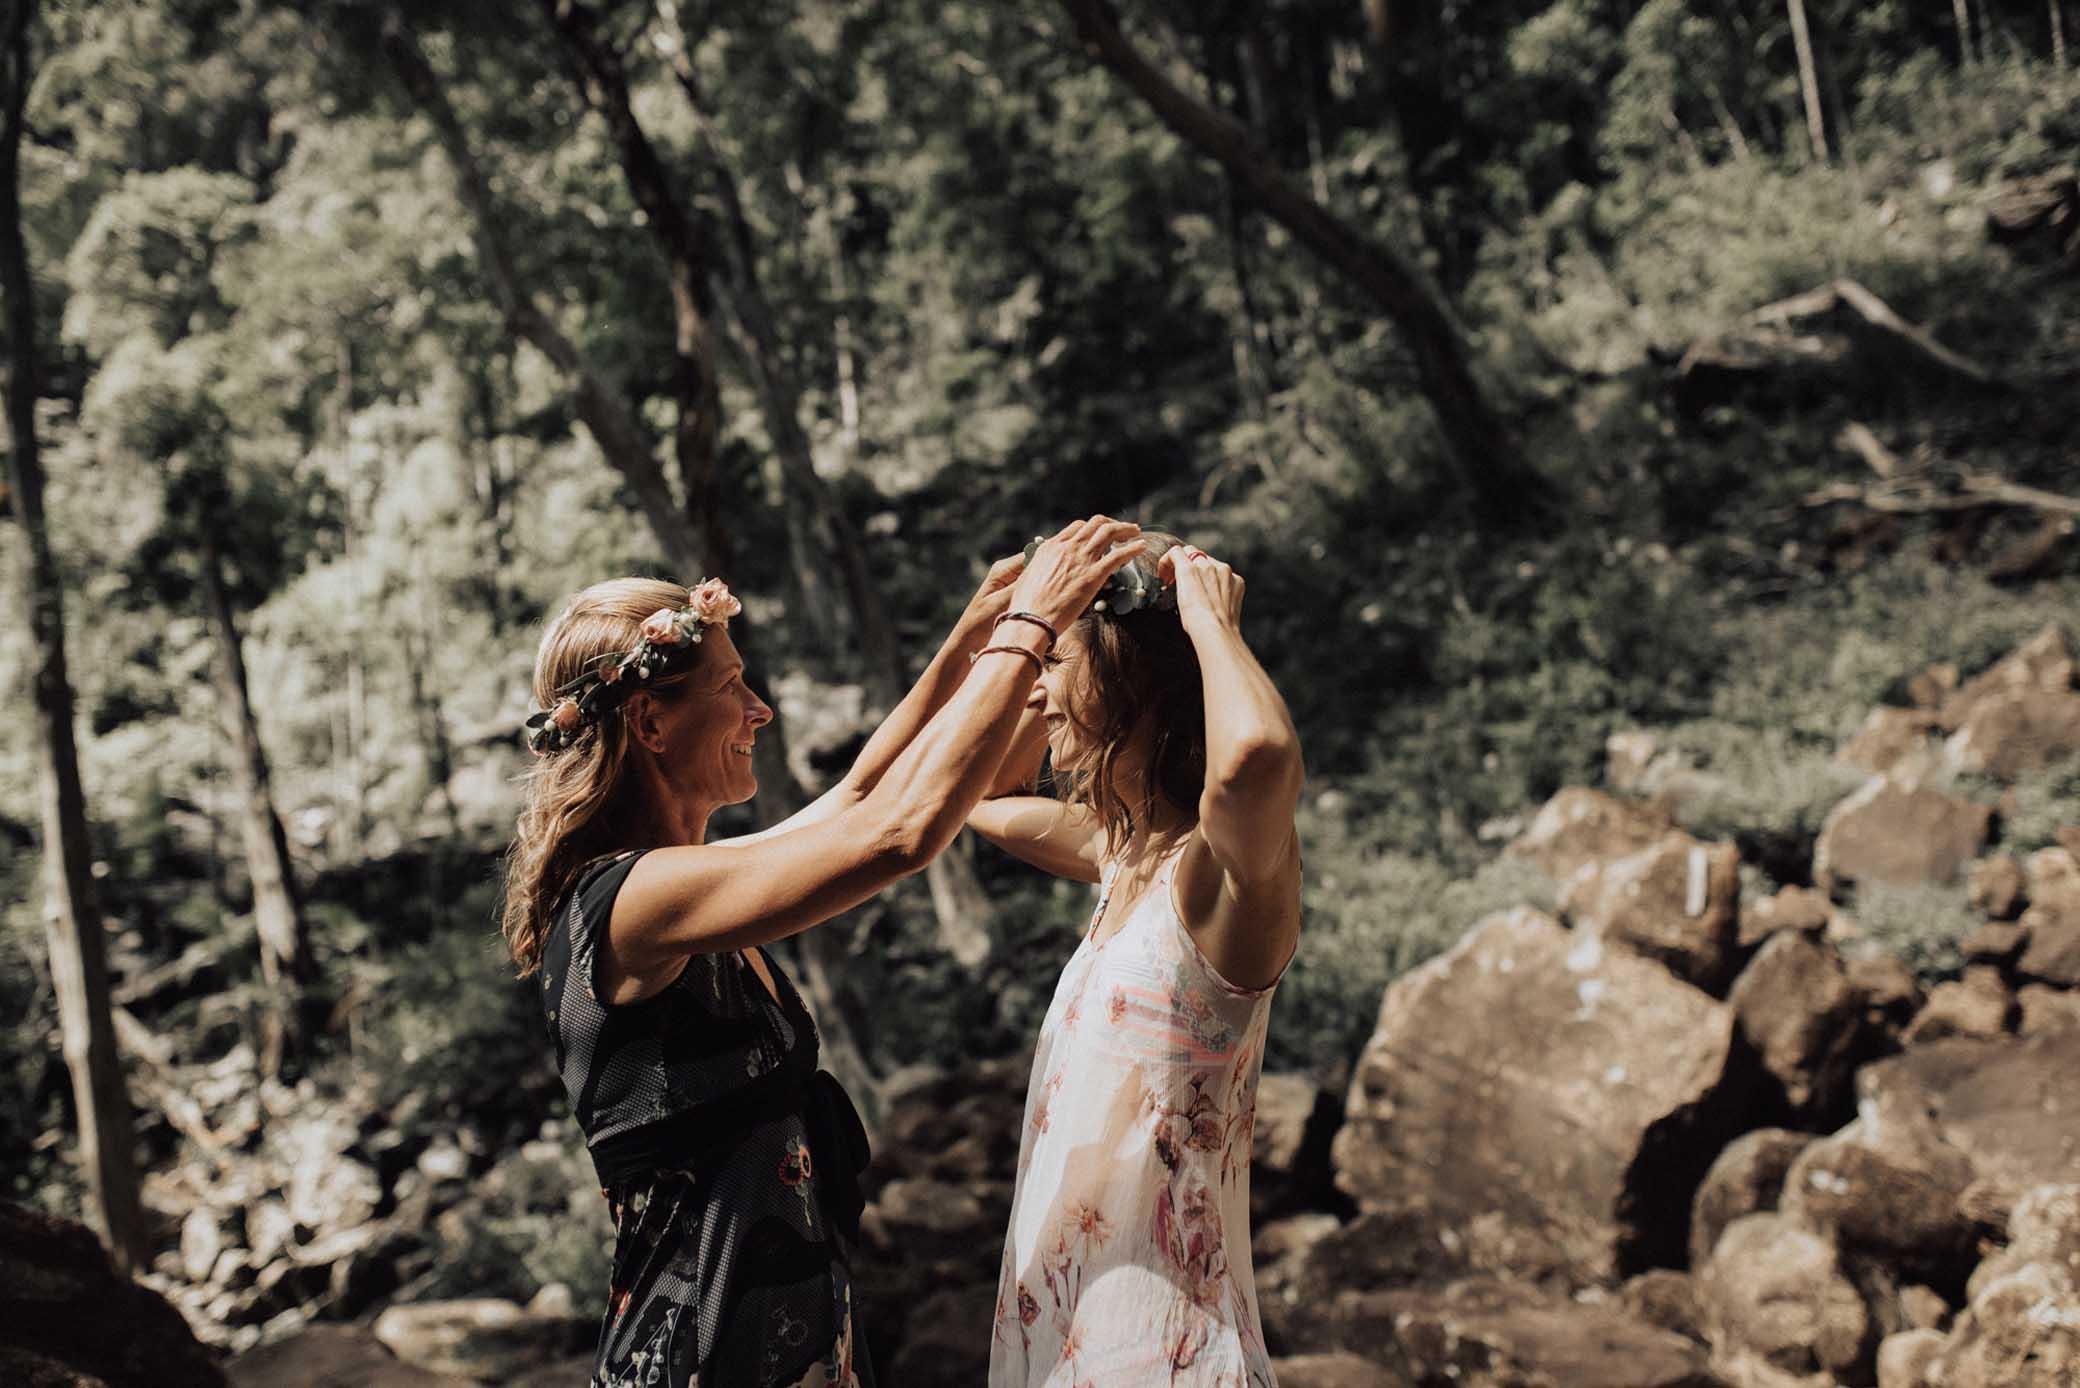 Bird & Boy Photography lesbian gay queer couple waterfall elopement wedding Byron Bay Hinterland NSW Australia Dancing With Her magazine